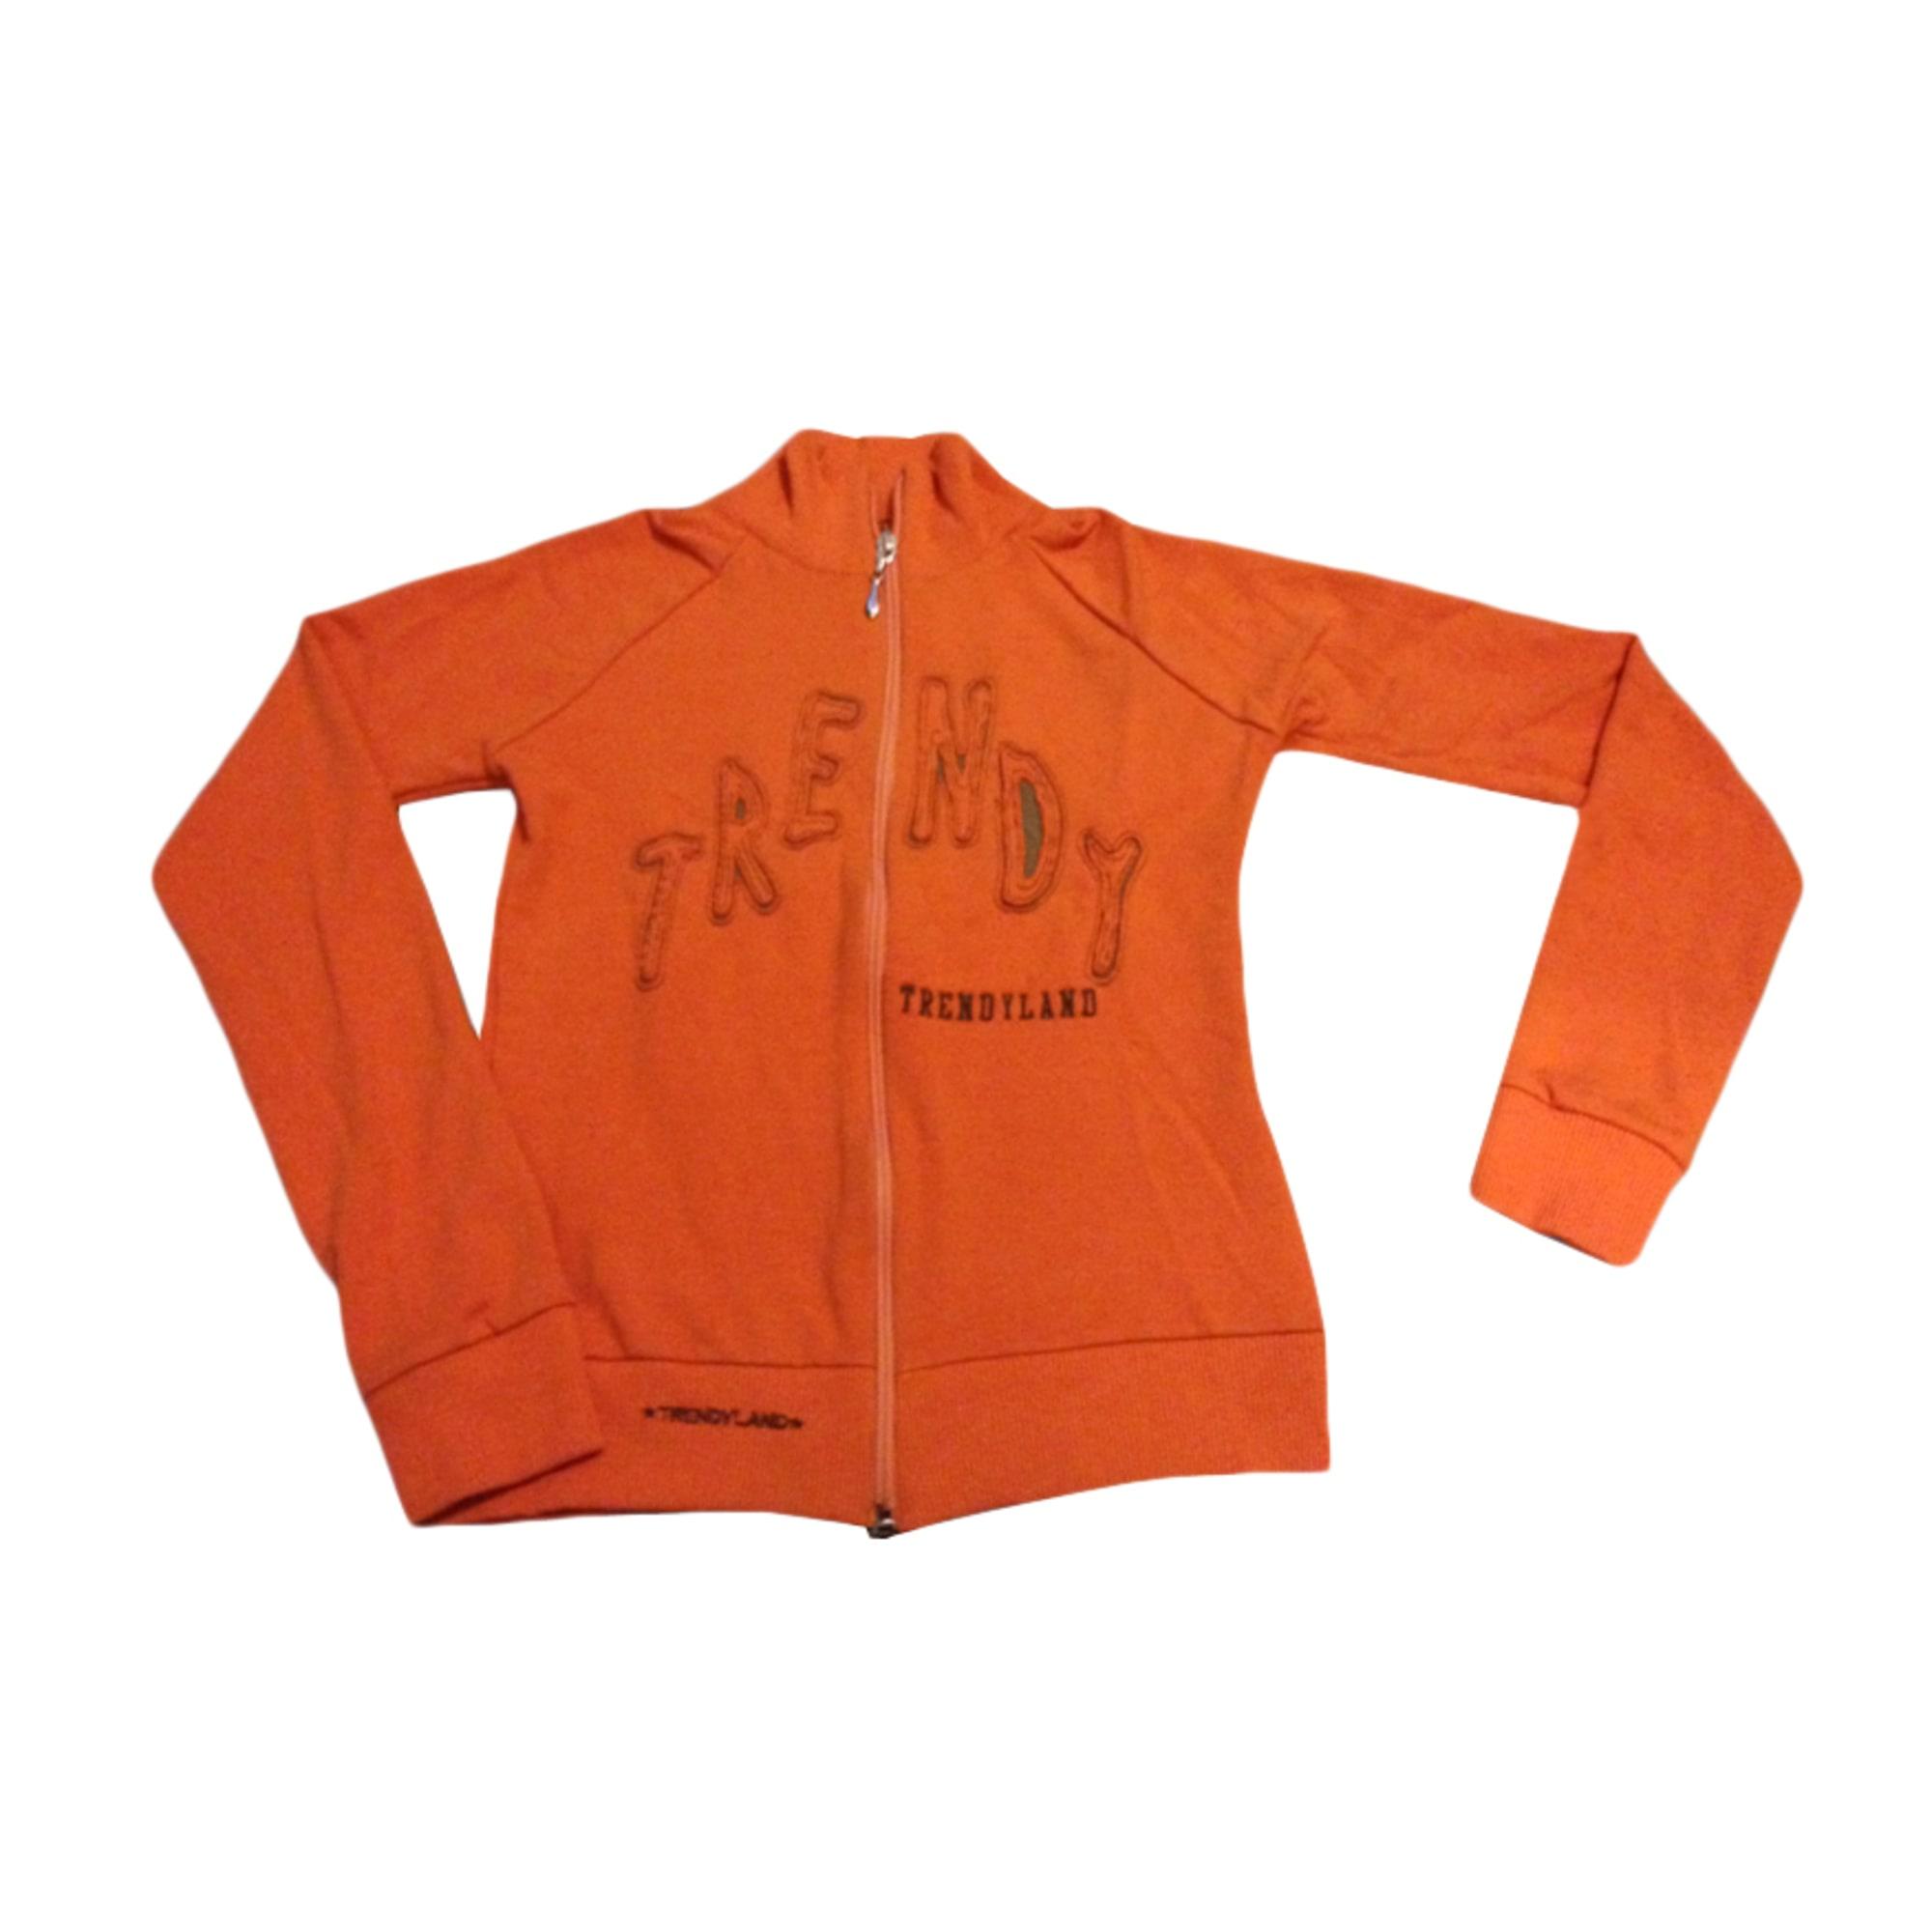 Gilet, cardigan TRENDYLAND Orange